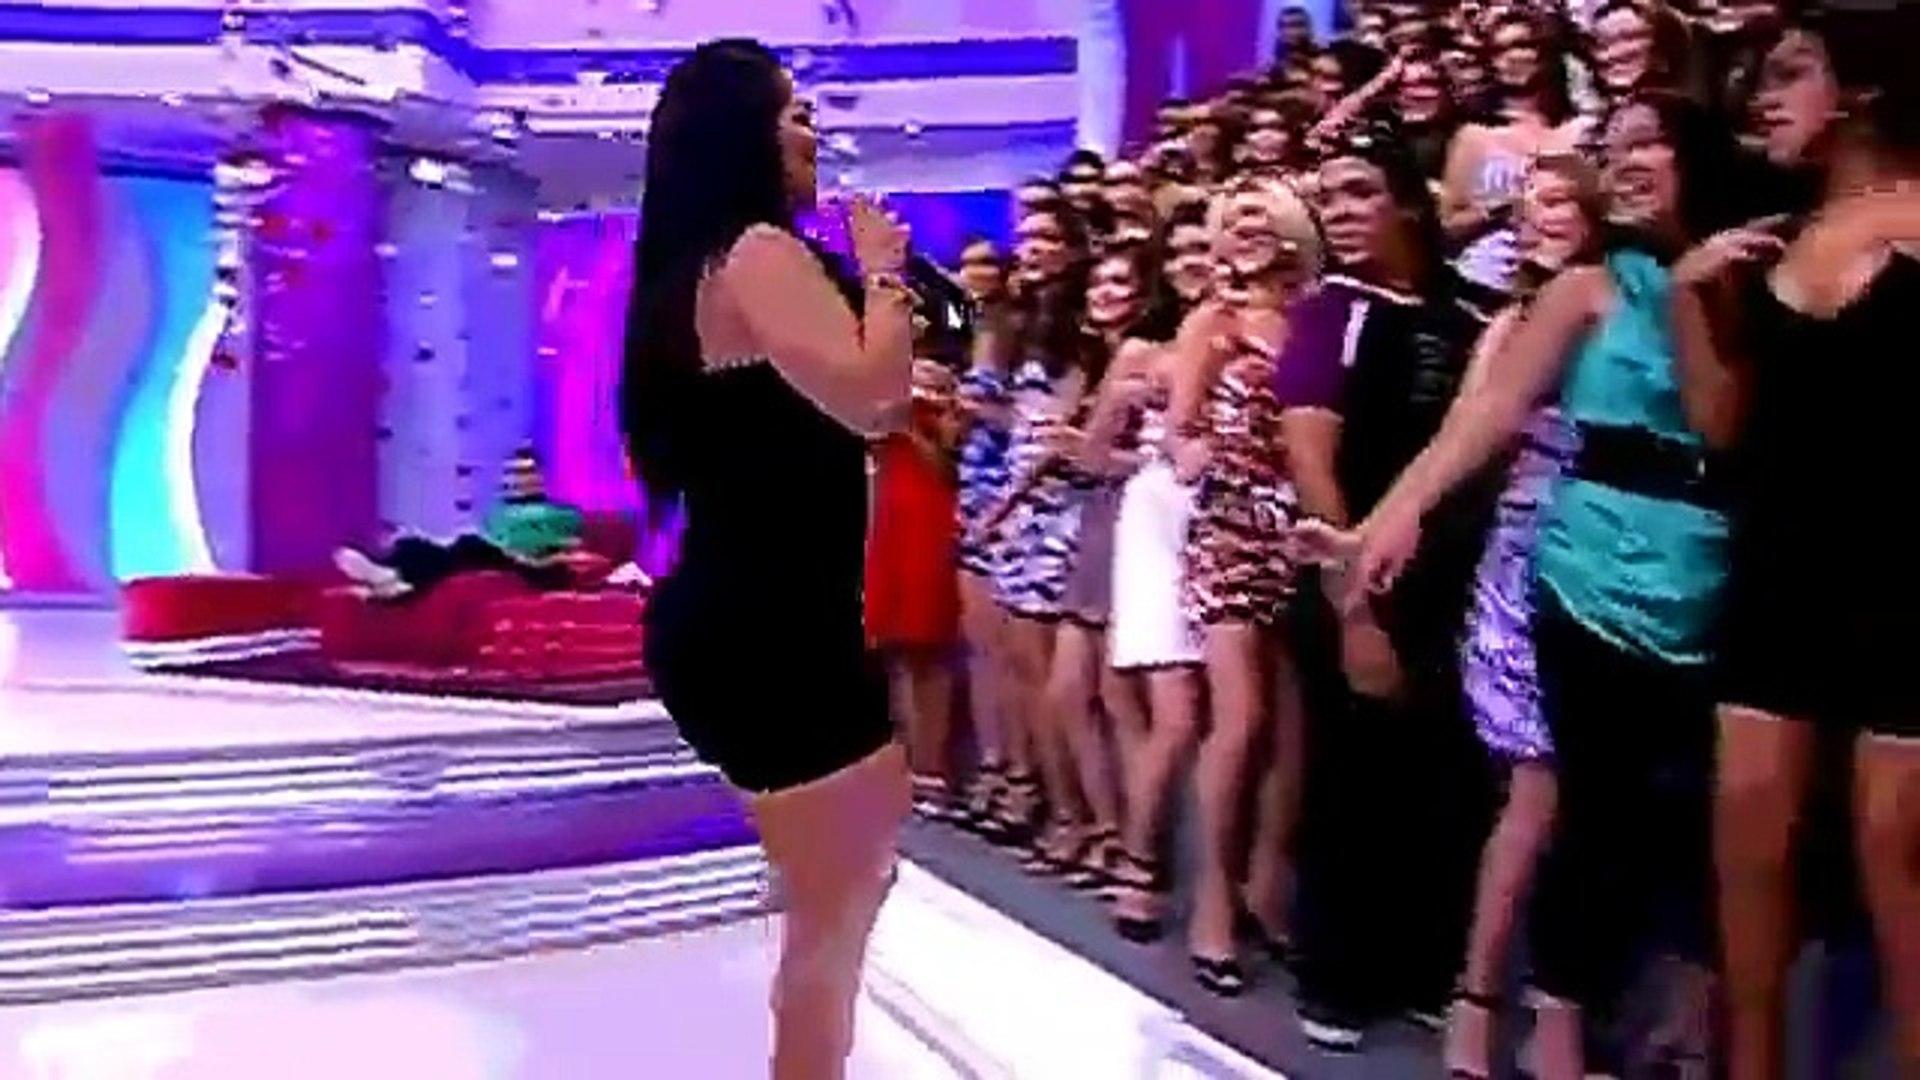 Andressa Soares Video mulher melancia - velocidade 6